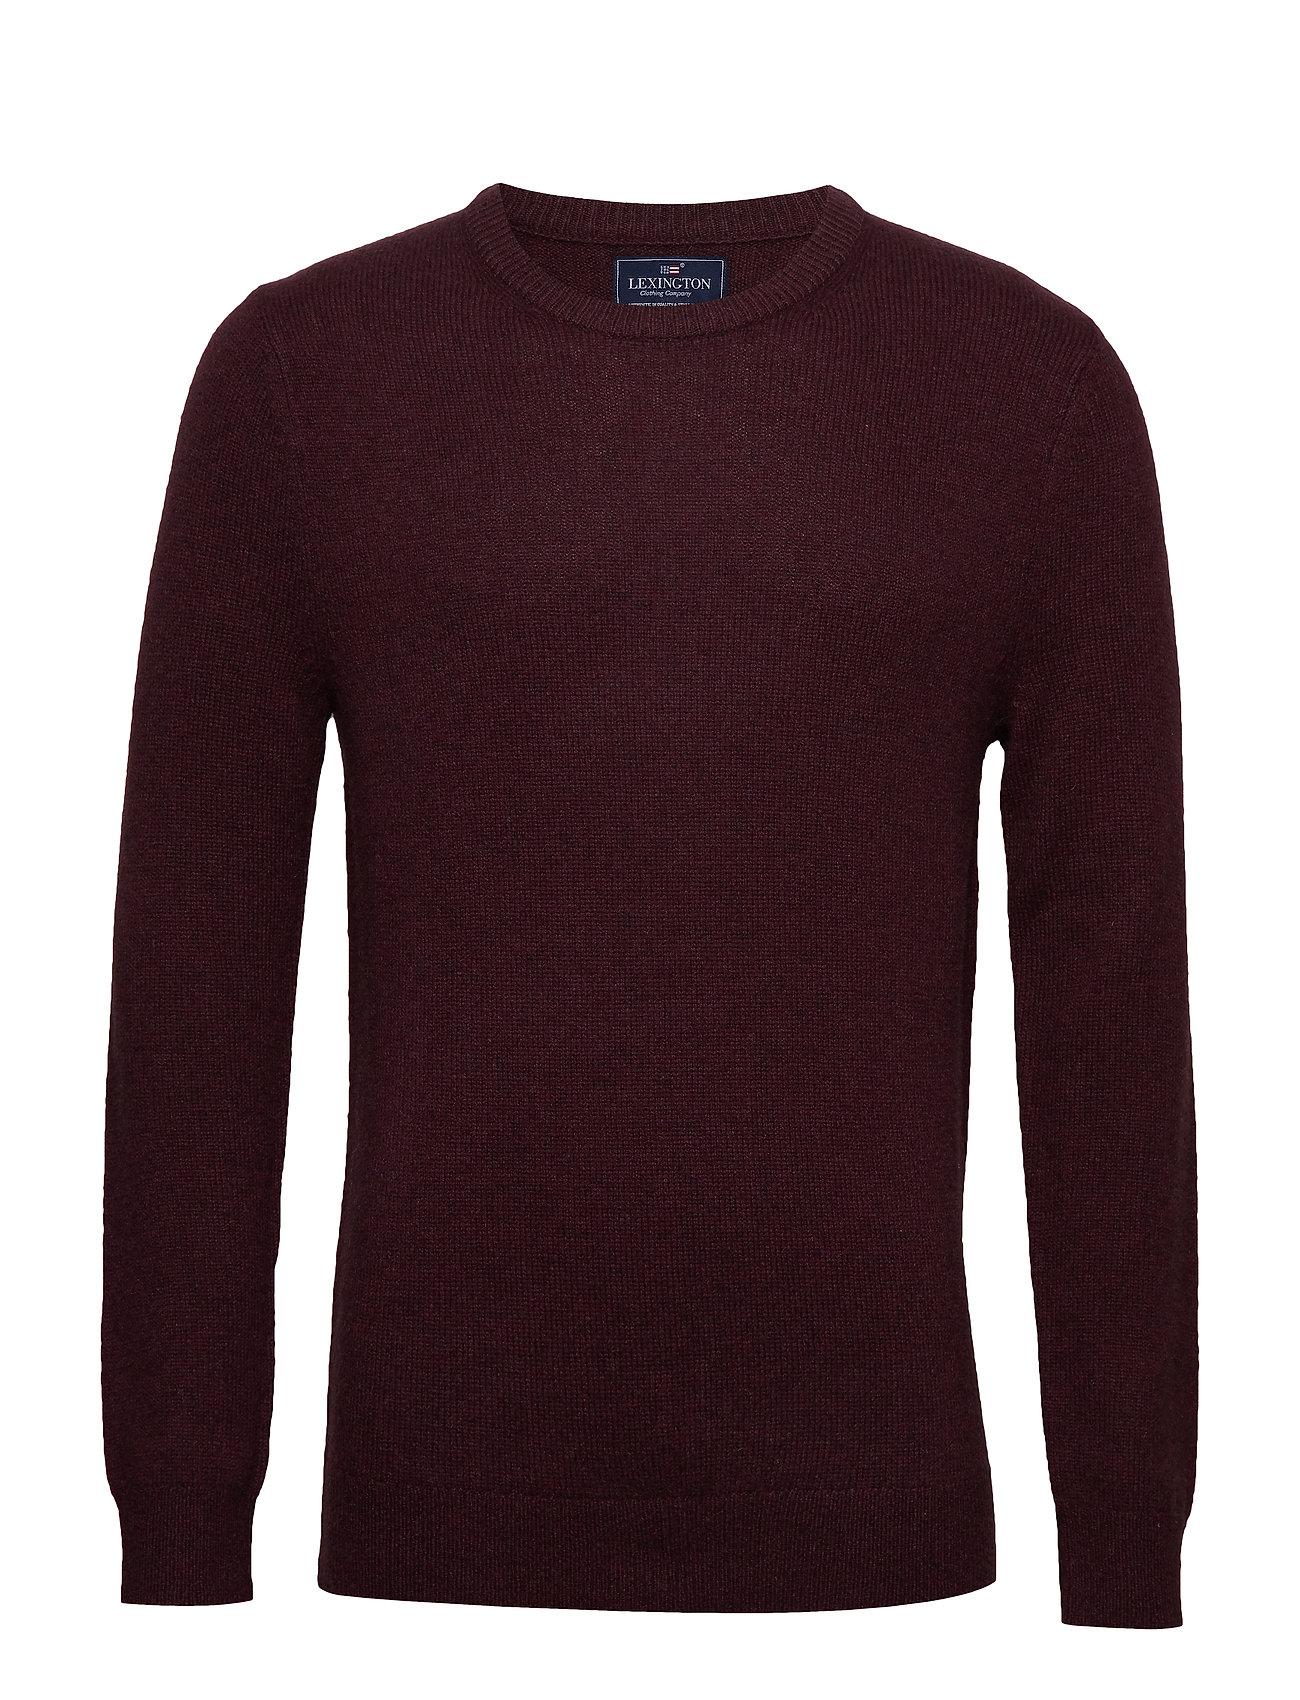 Lexington Clothing Tyrion Sweater